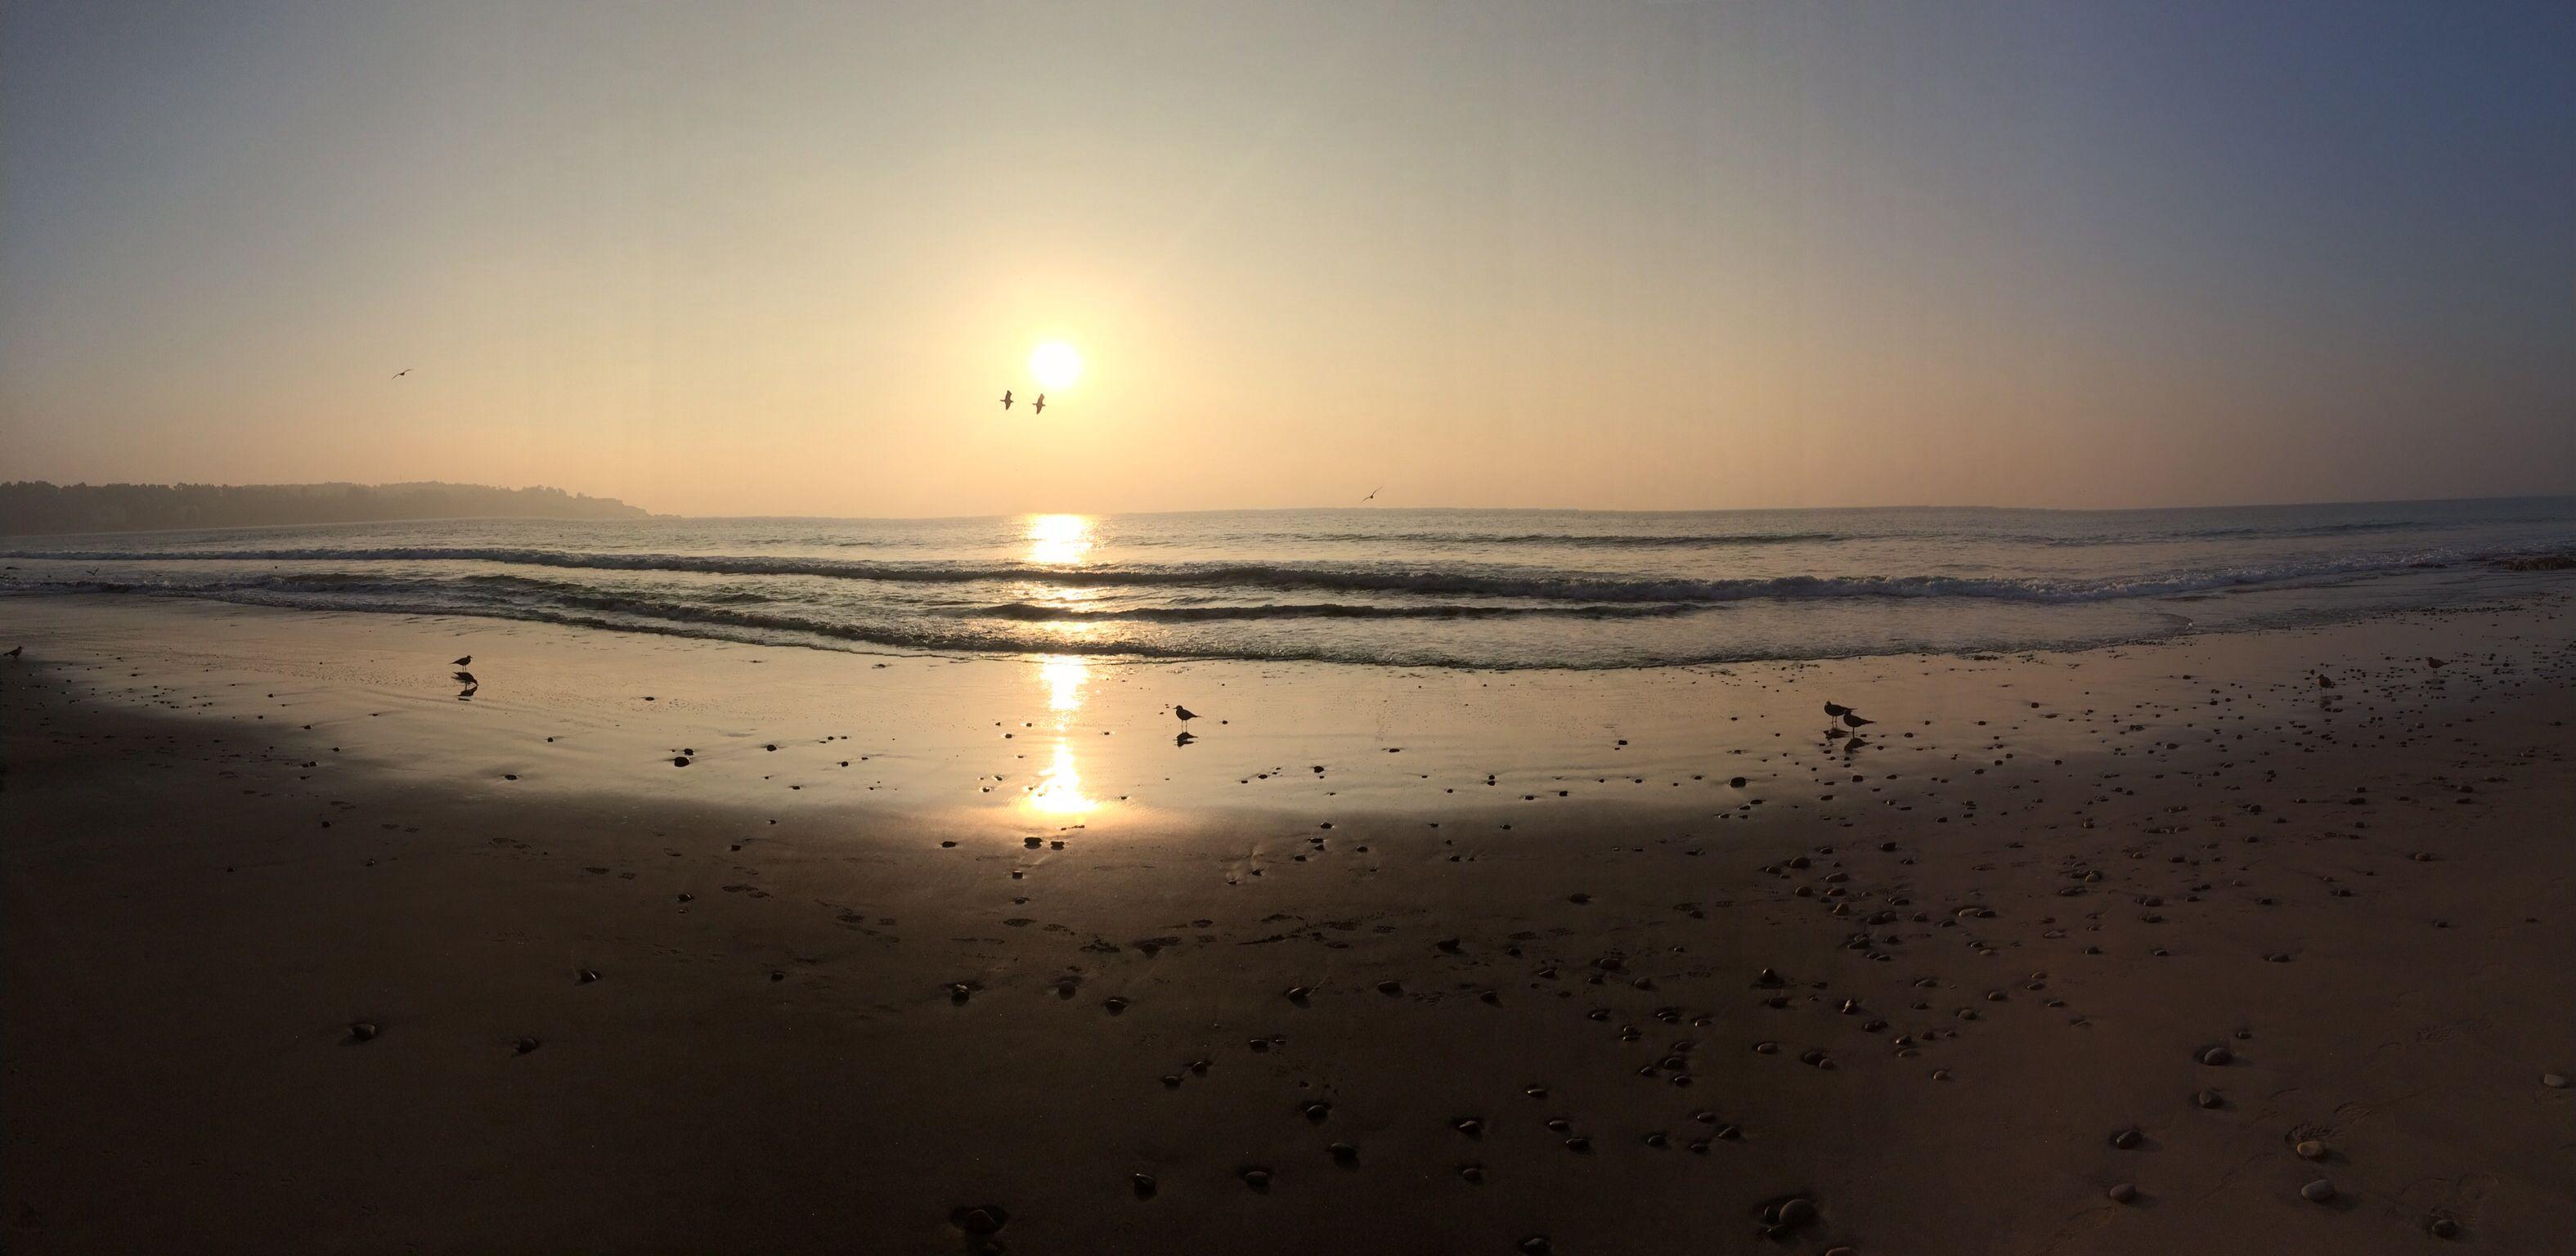 Atardecer invernal en la playa.